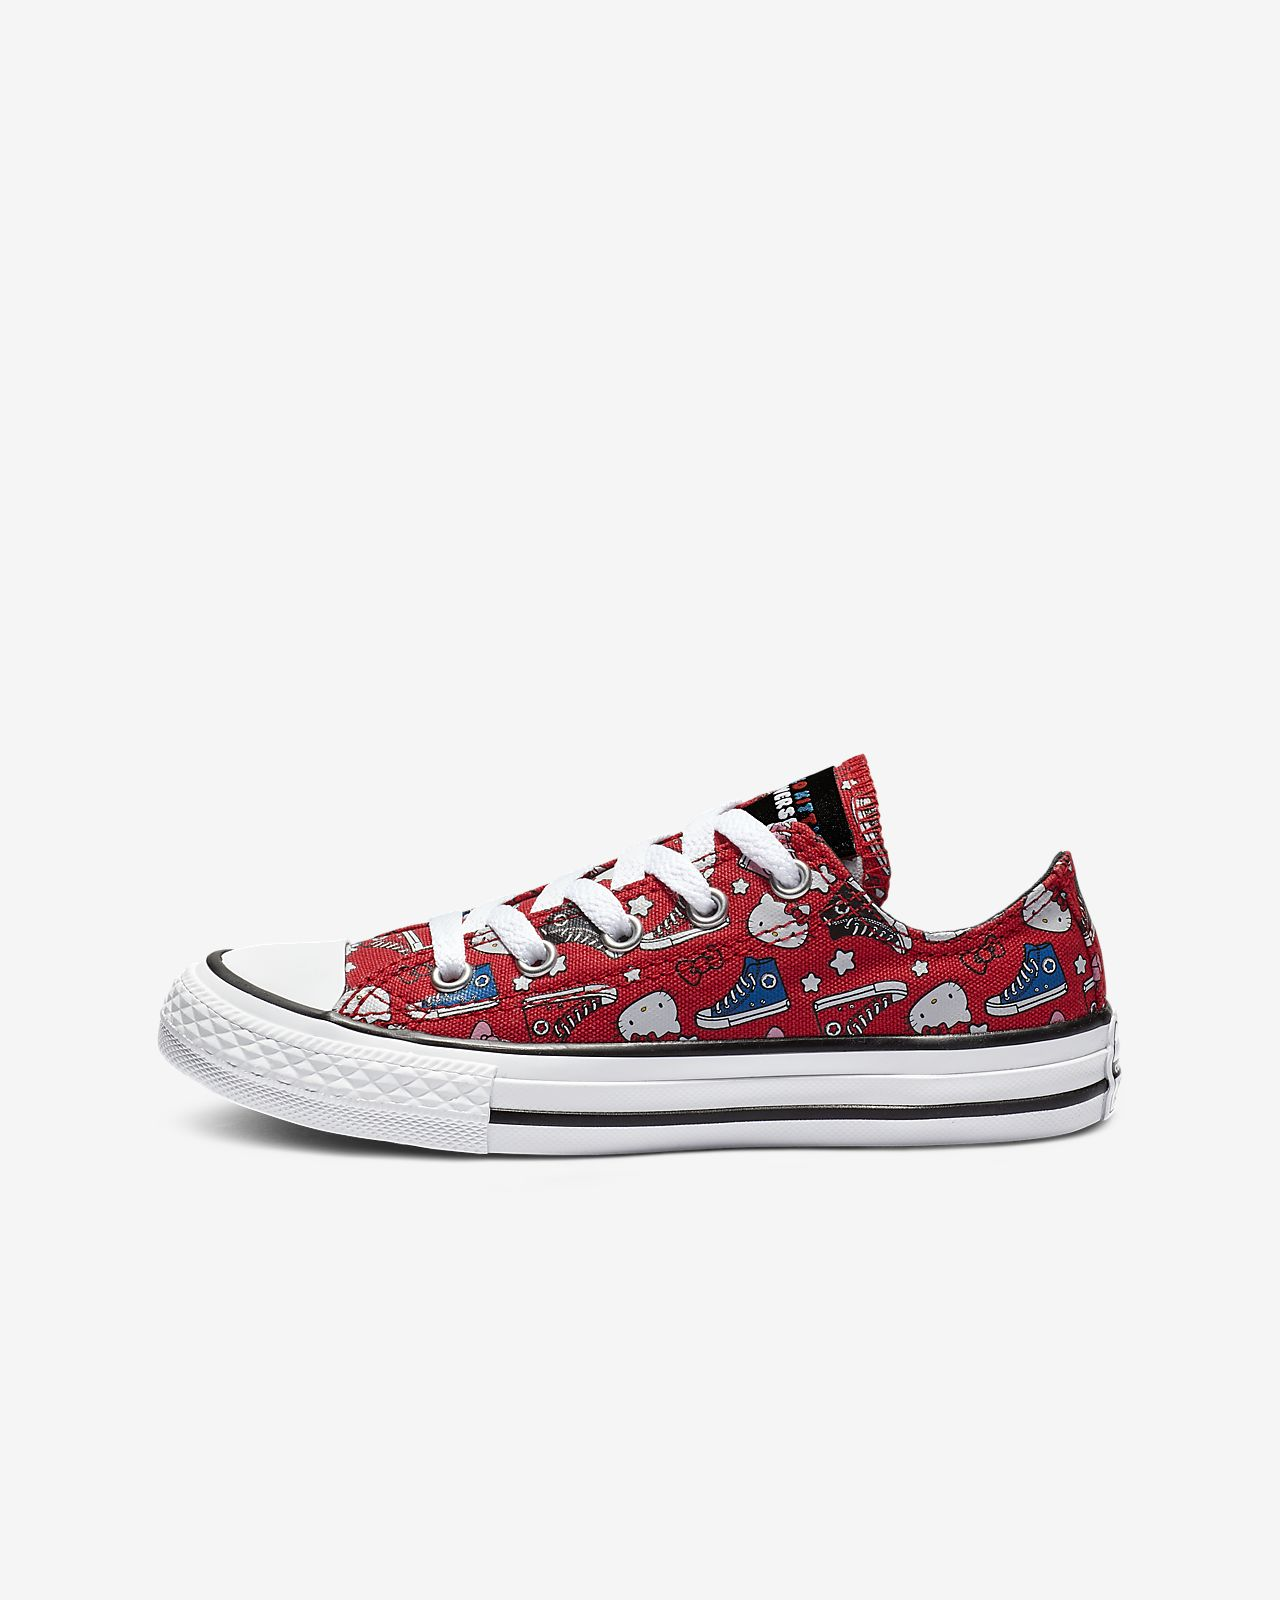 Converse x Hello Kitty Chuck Taylor All Star Low Top Big Kids' Shoe